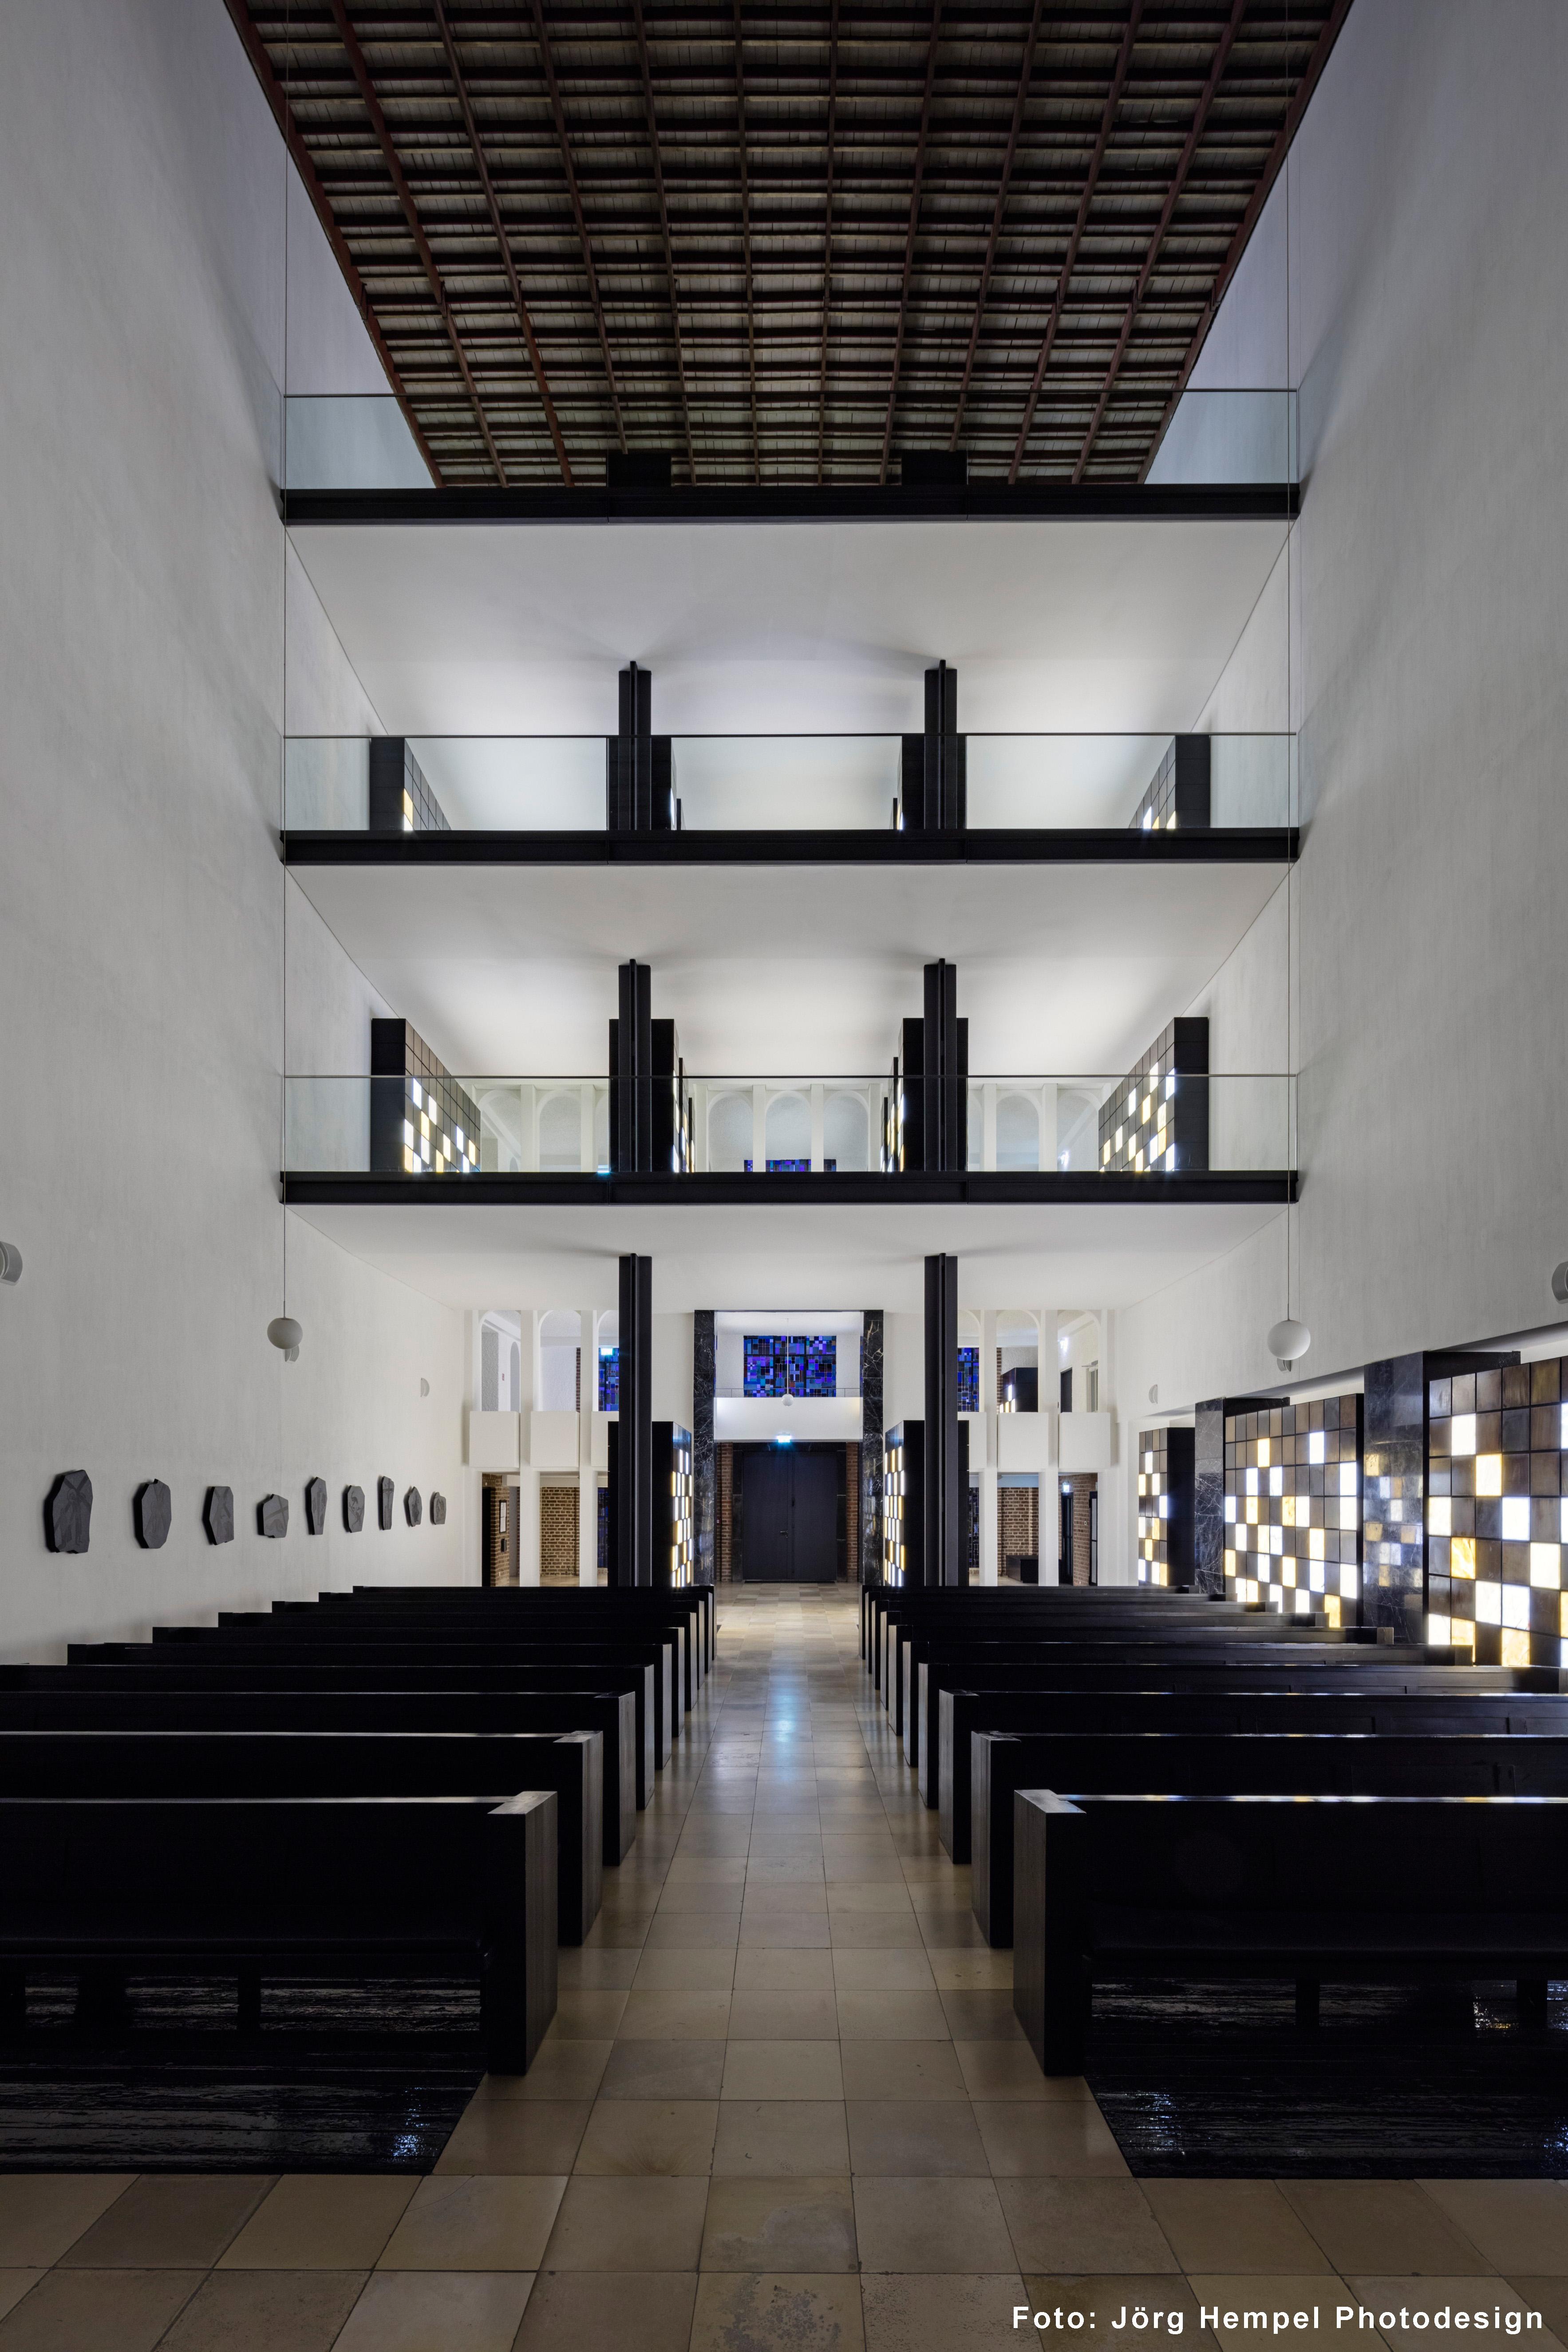 Architekt Mönchengladbach architekten bda st kamillus kolumbarium mönchengladbach